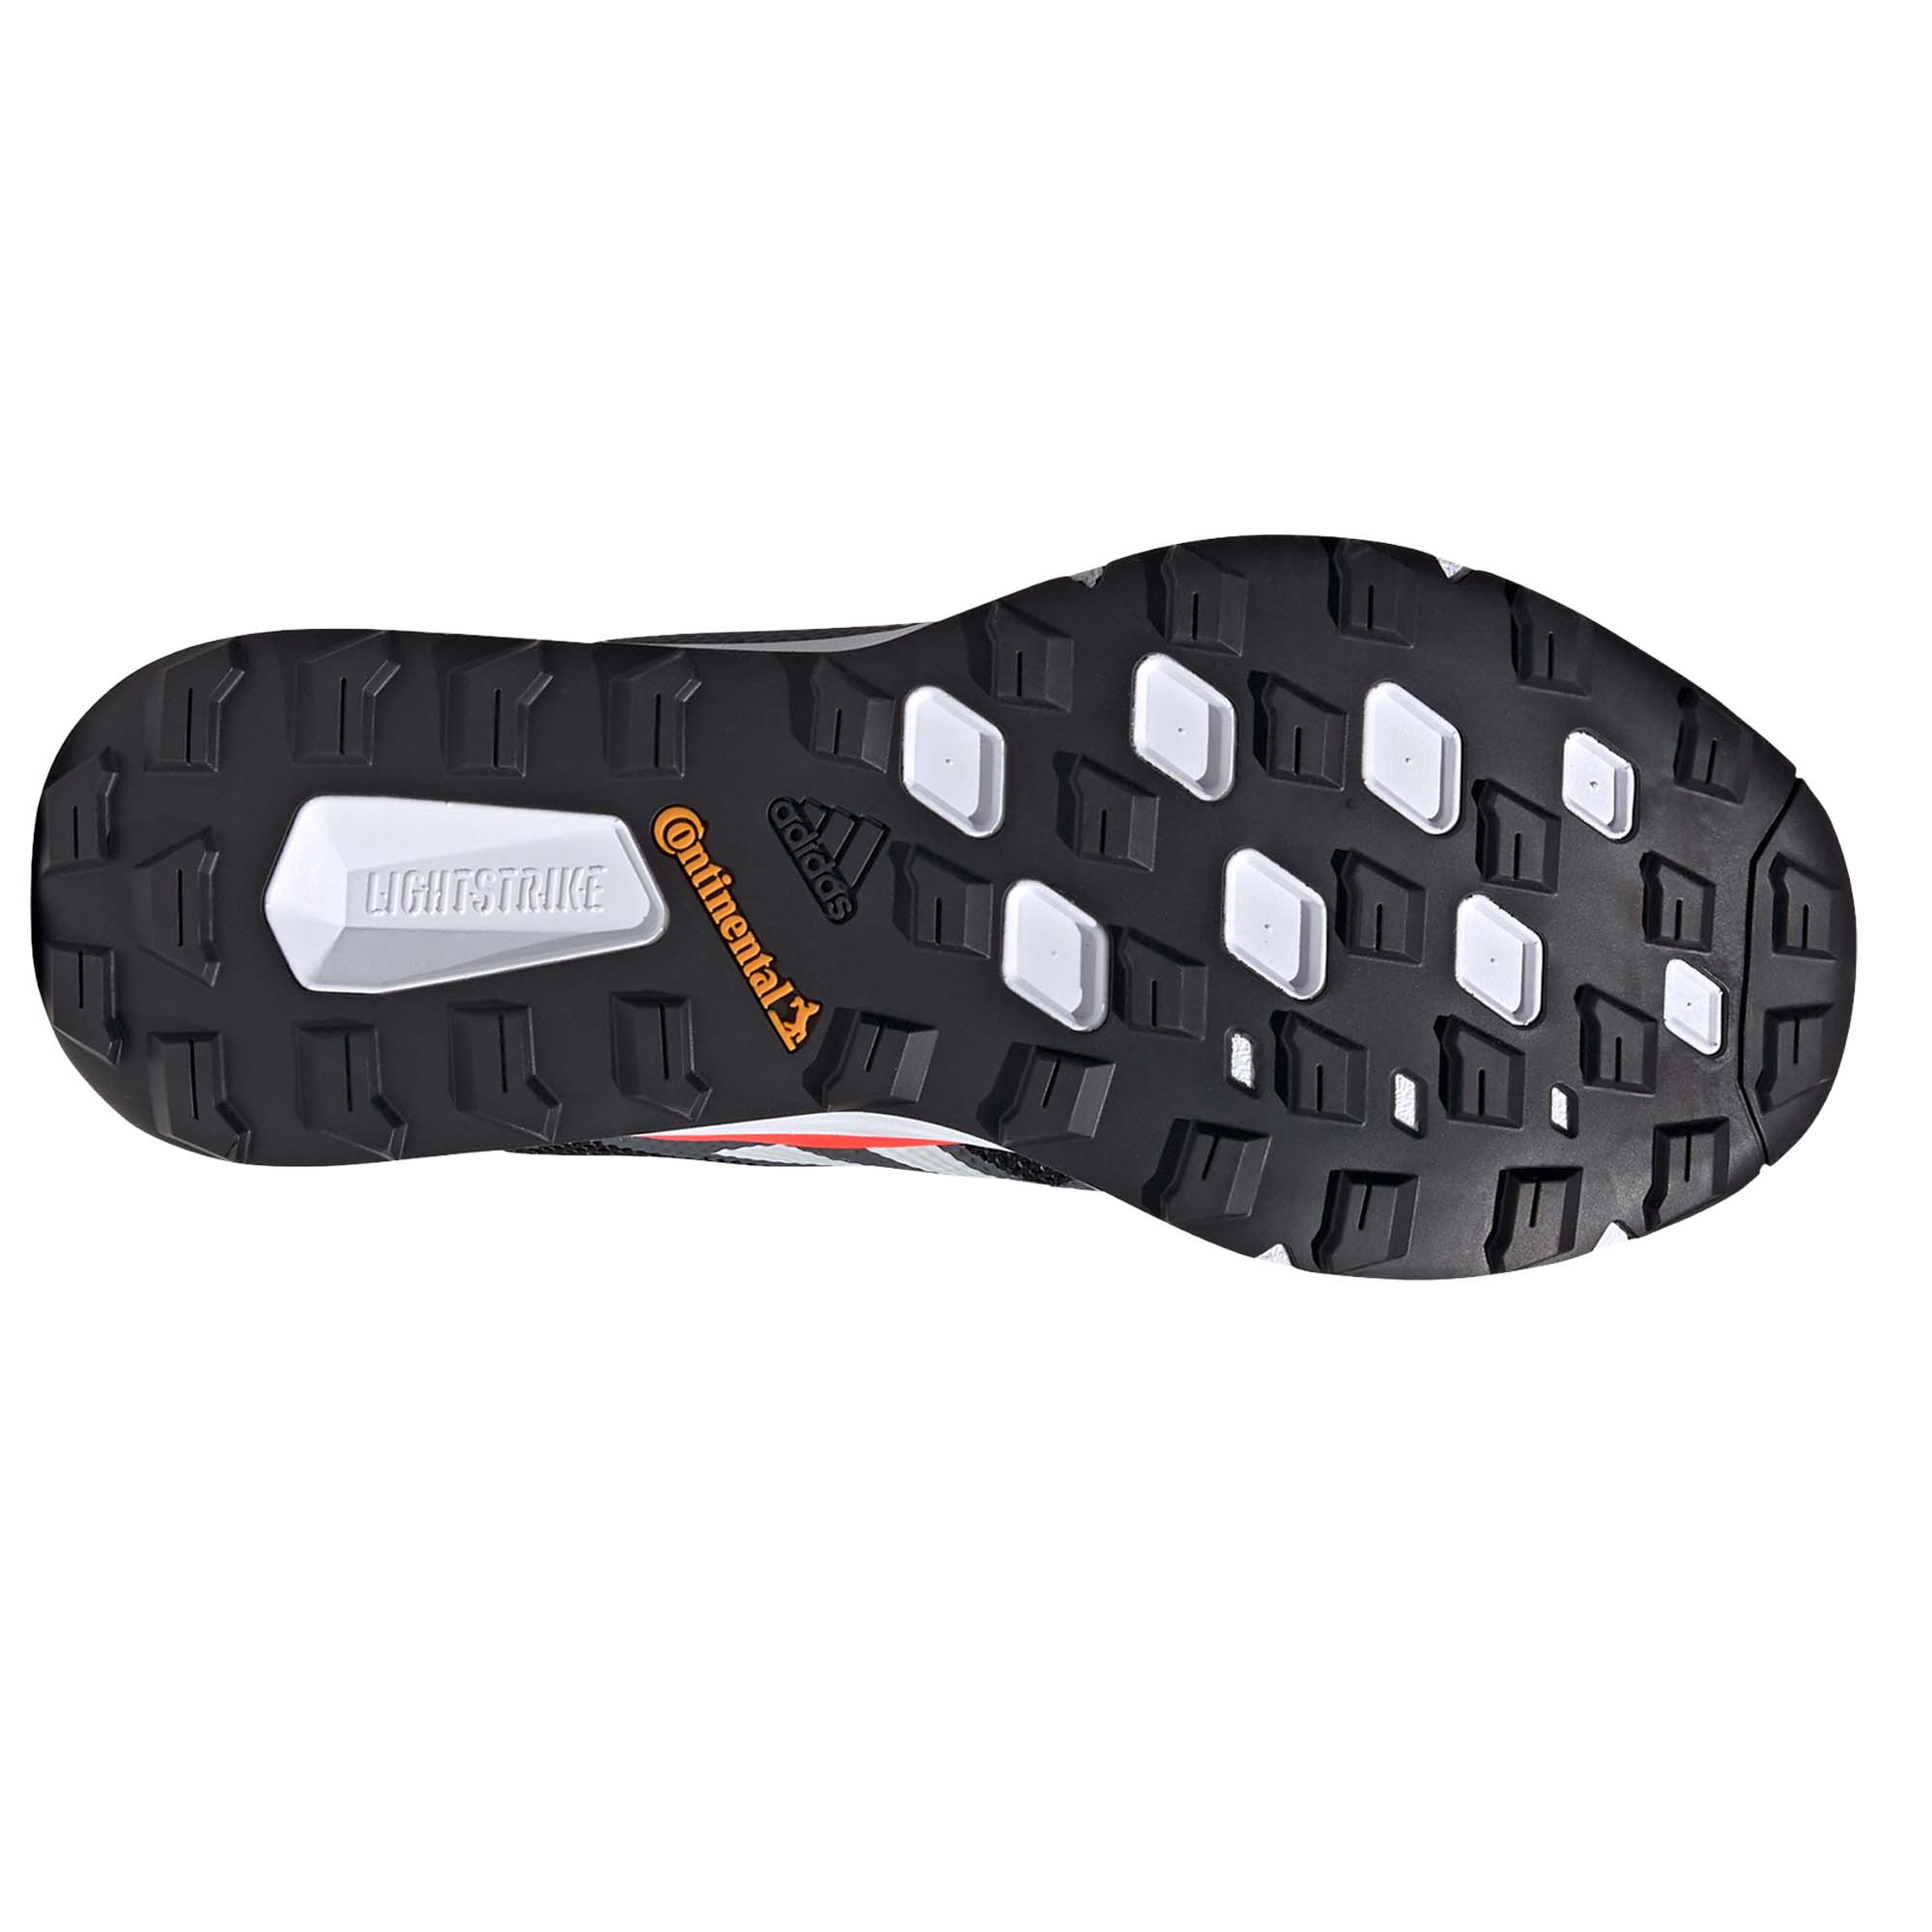 miniatura 7 - ADIDAS Terrex Due Da Uomo Scarpa Trail Running Scarpe da ginnastica nero/bianco/rosso